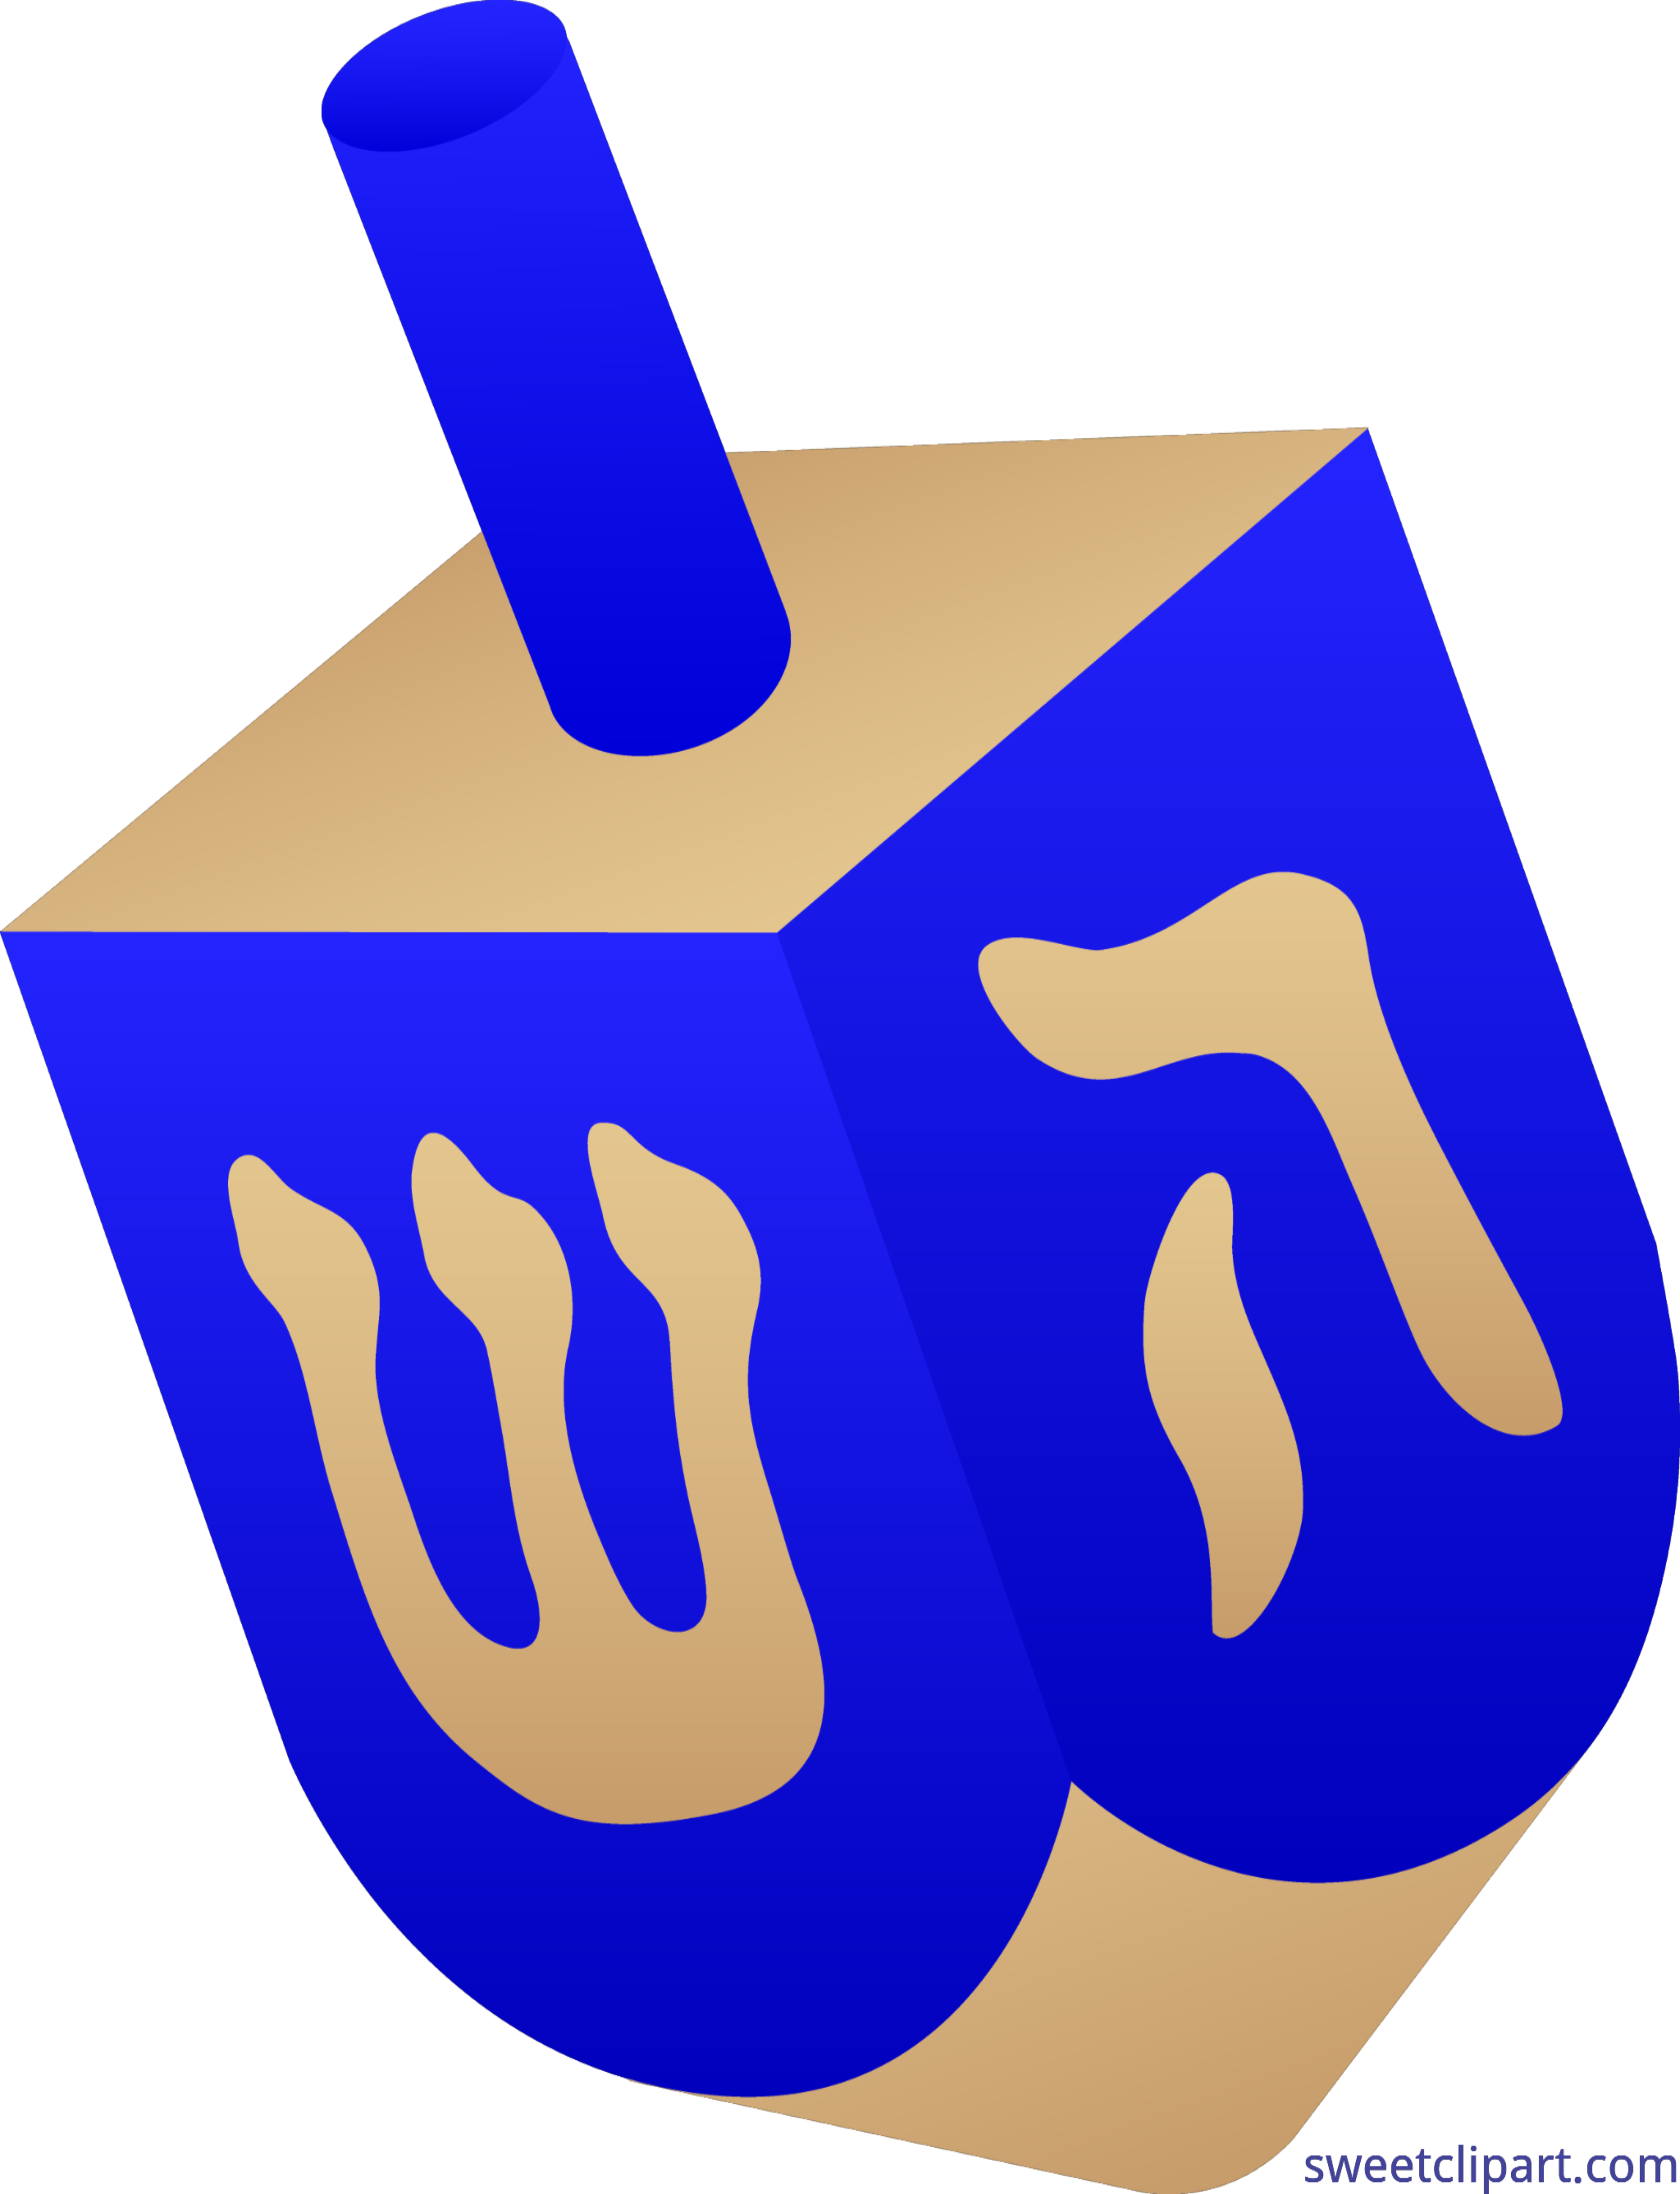 Dreidel clipart. Clip art sweet